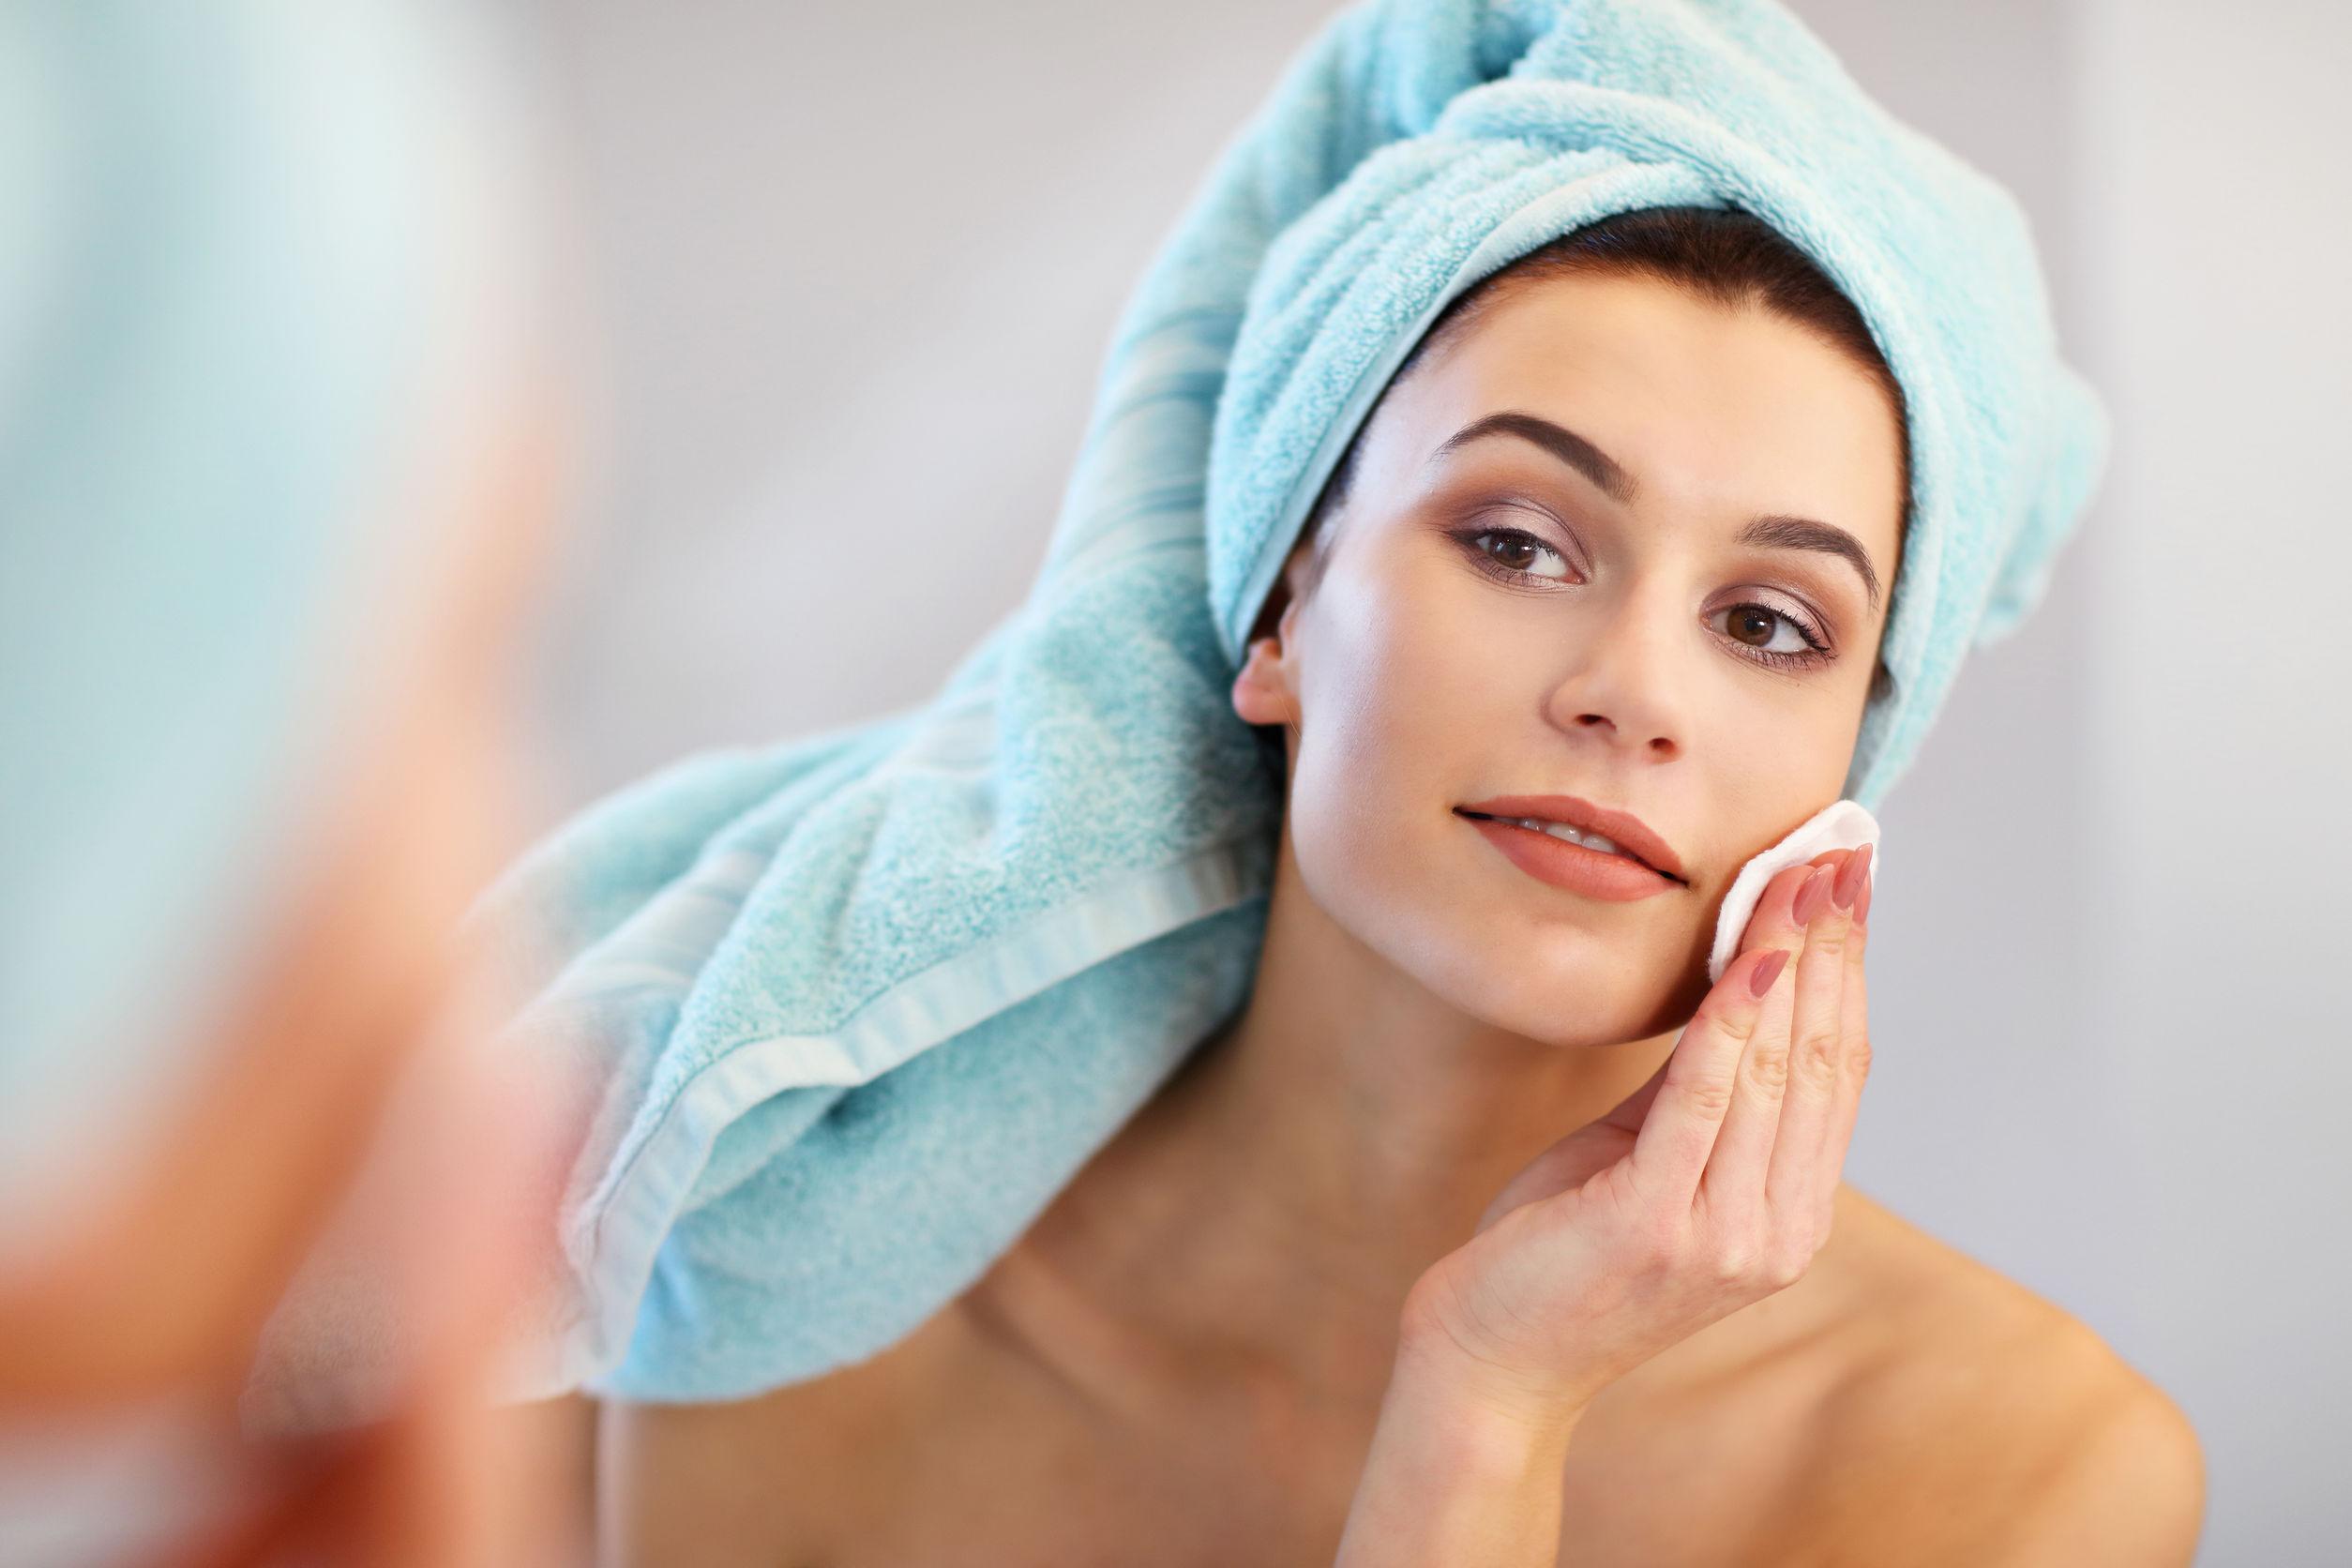 Mujer limpiandose la cara